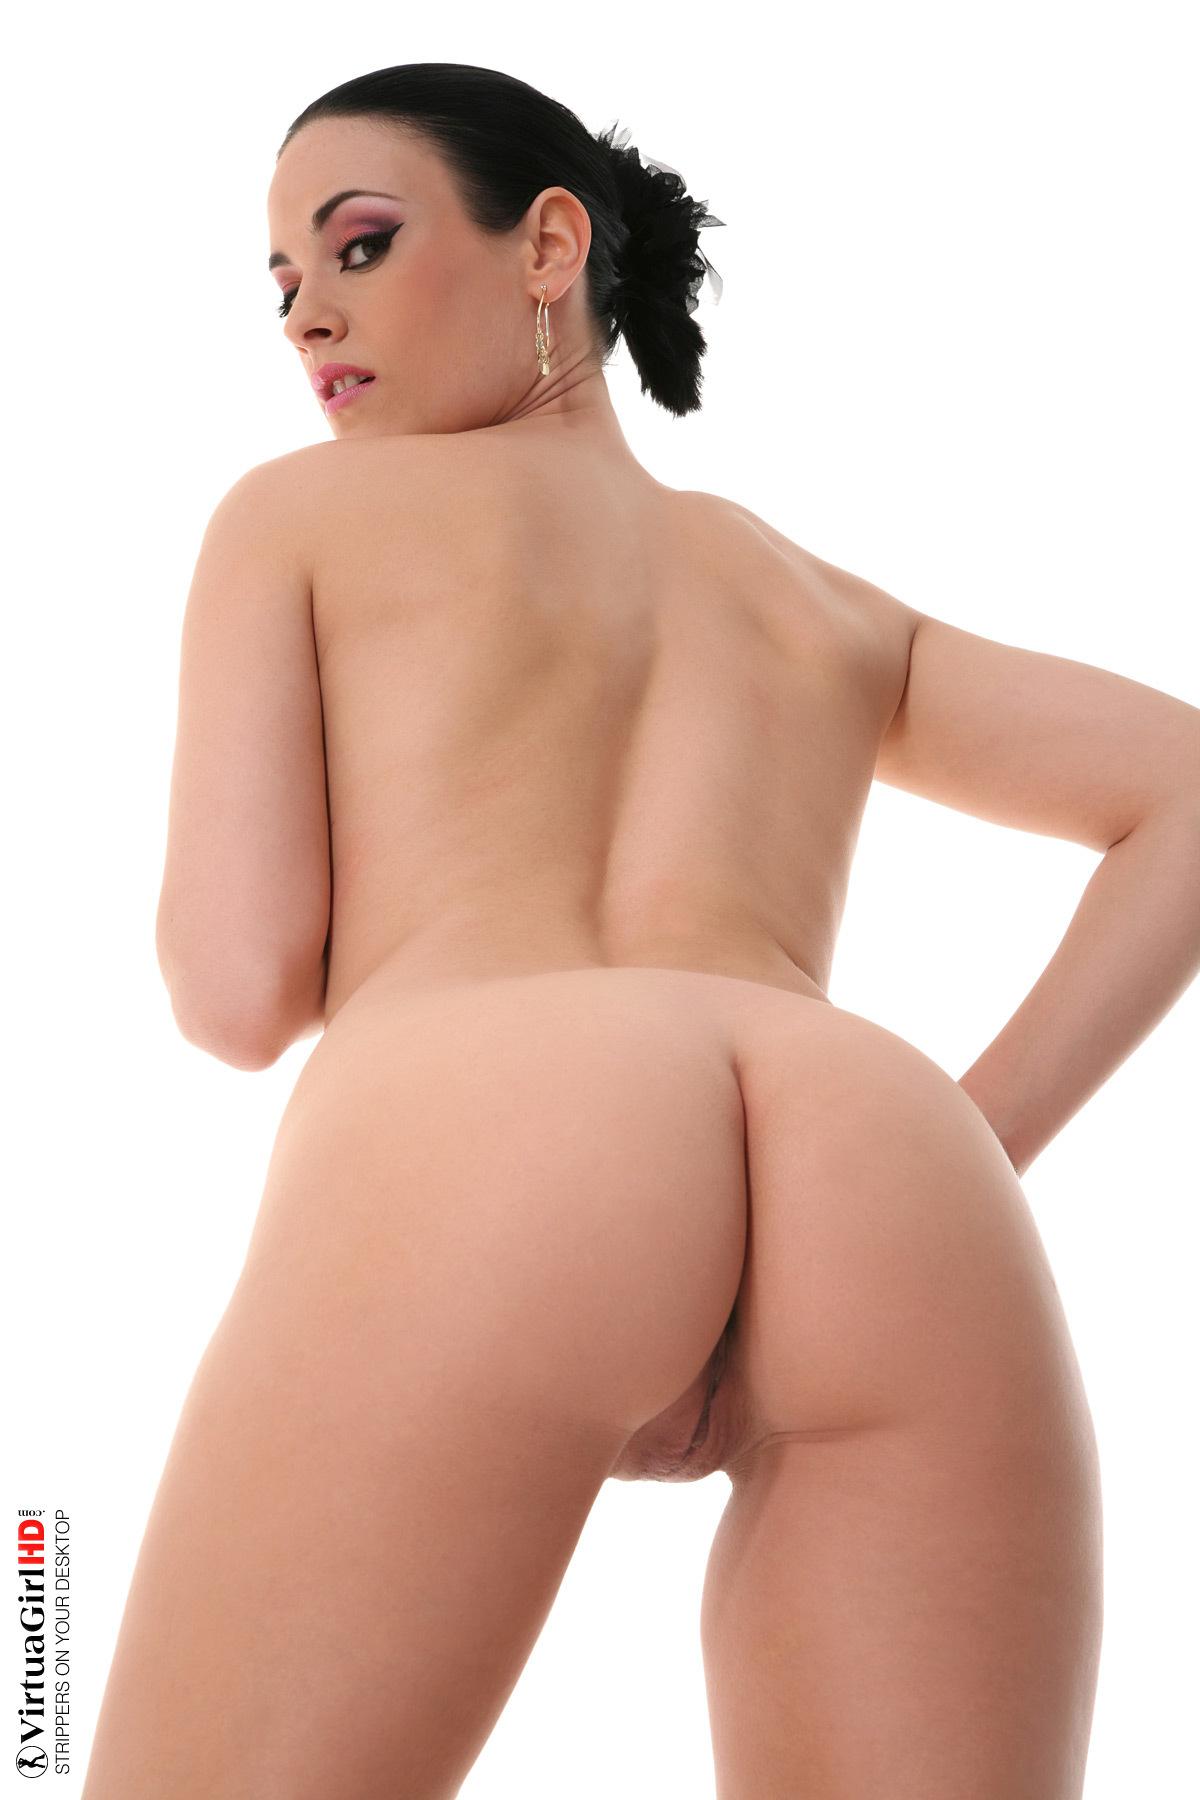 girls stripping in thongs